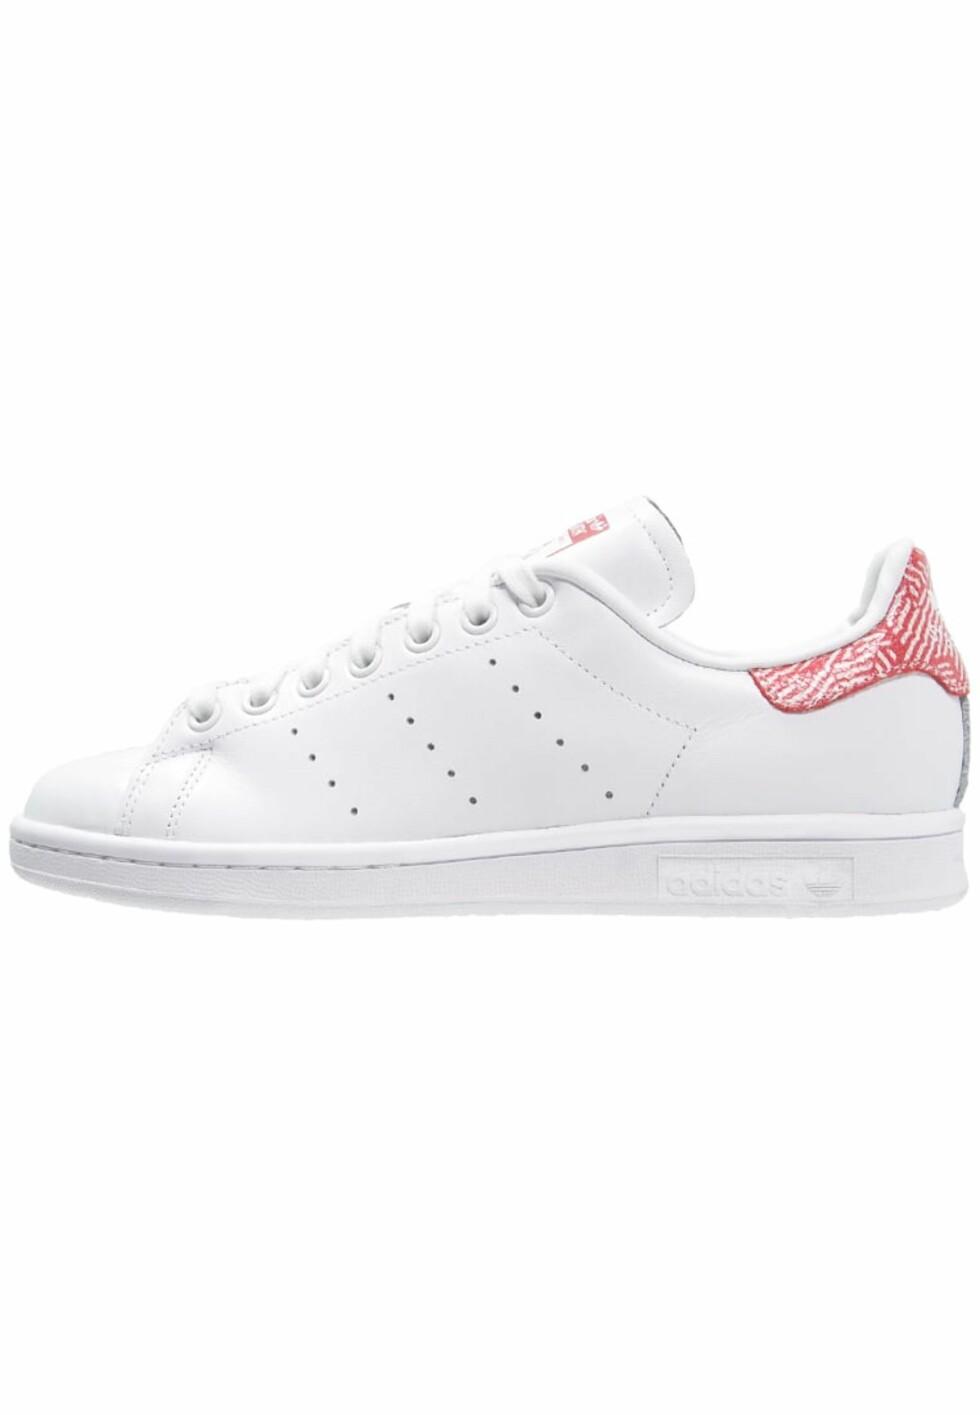 Stan Smith-sneakers fra Adidas med mønster bak via Zalando.no | kr 899 | pn.zalando.net/go.cgi?pid=1173&wmid=cc&cpid=12&target=http://www.zalando.no/adidas-originals-stan-smith-joggesko-white-collegiate-red-ad111s0cb-a11.html